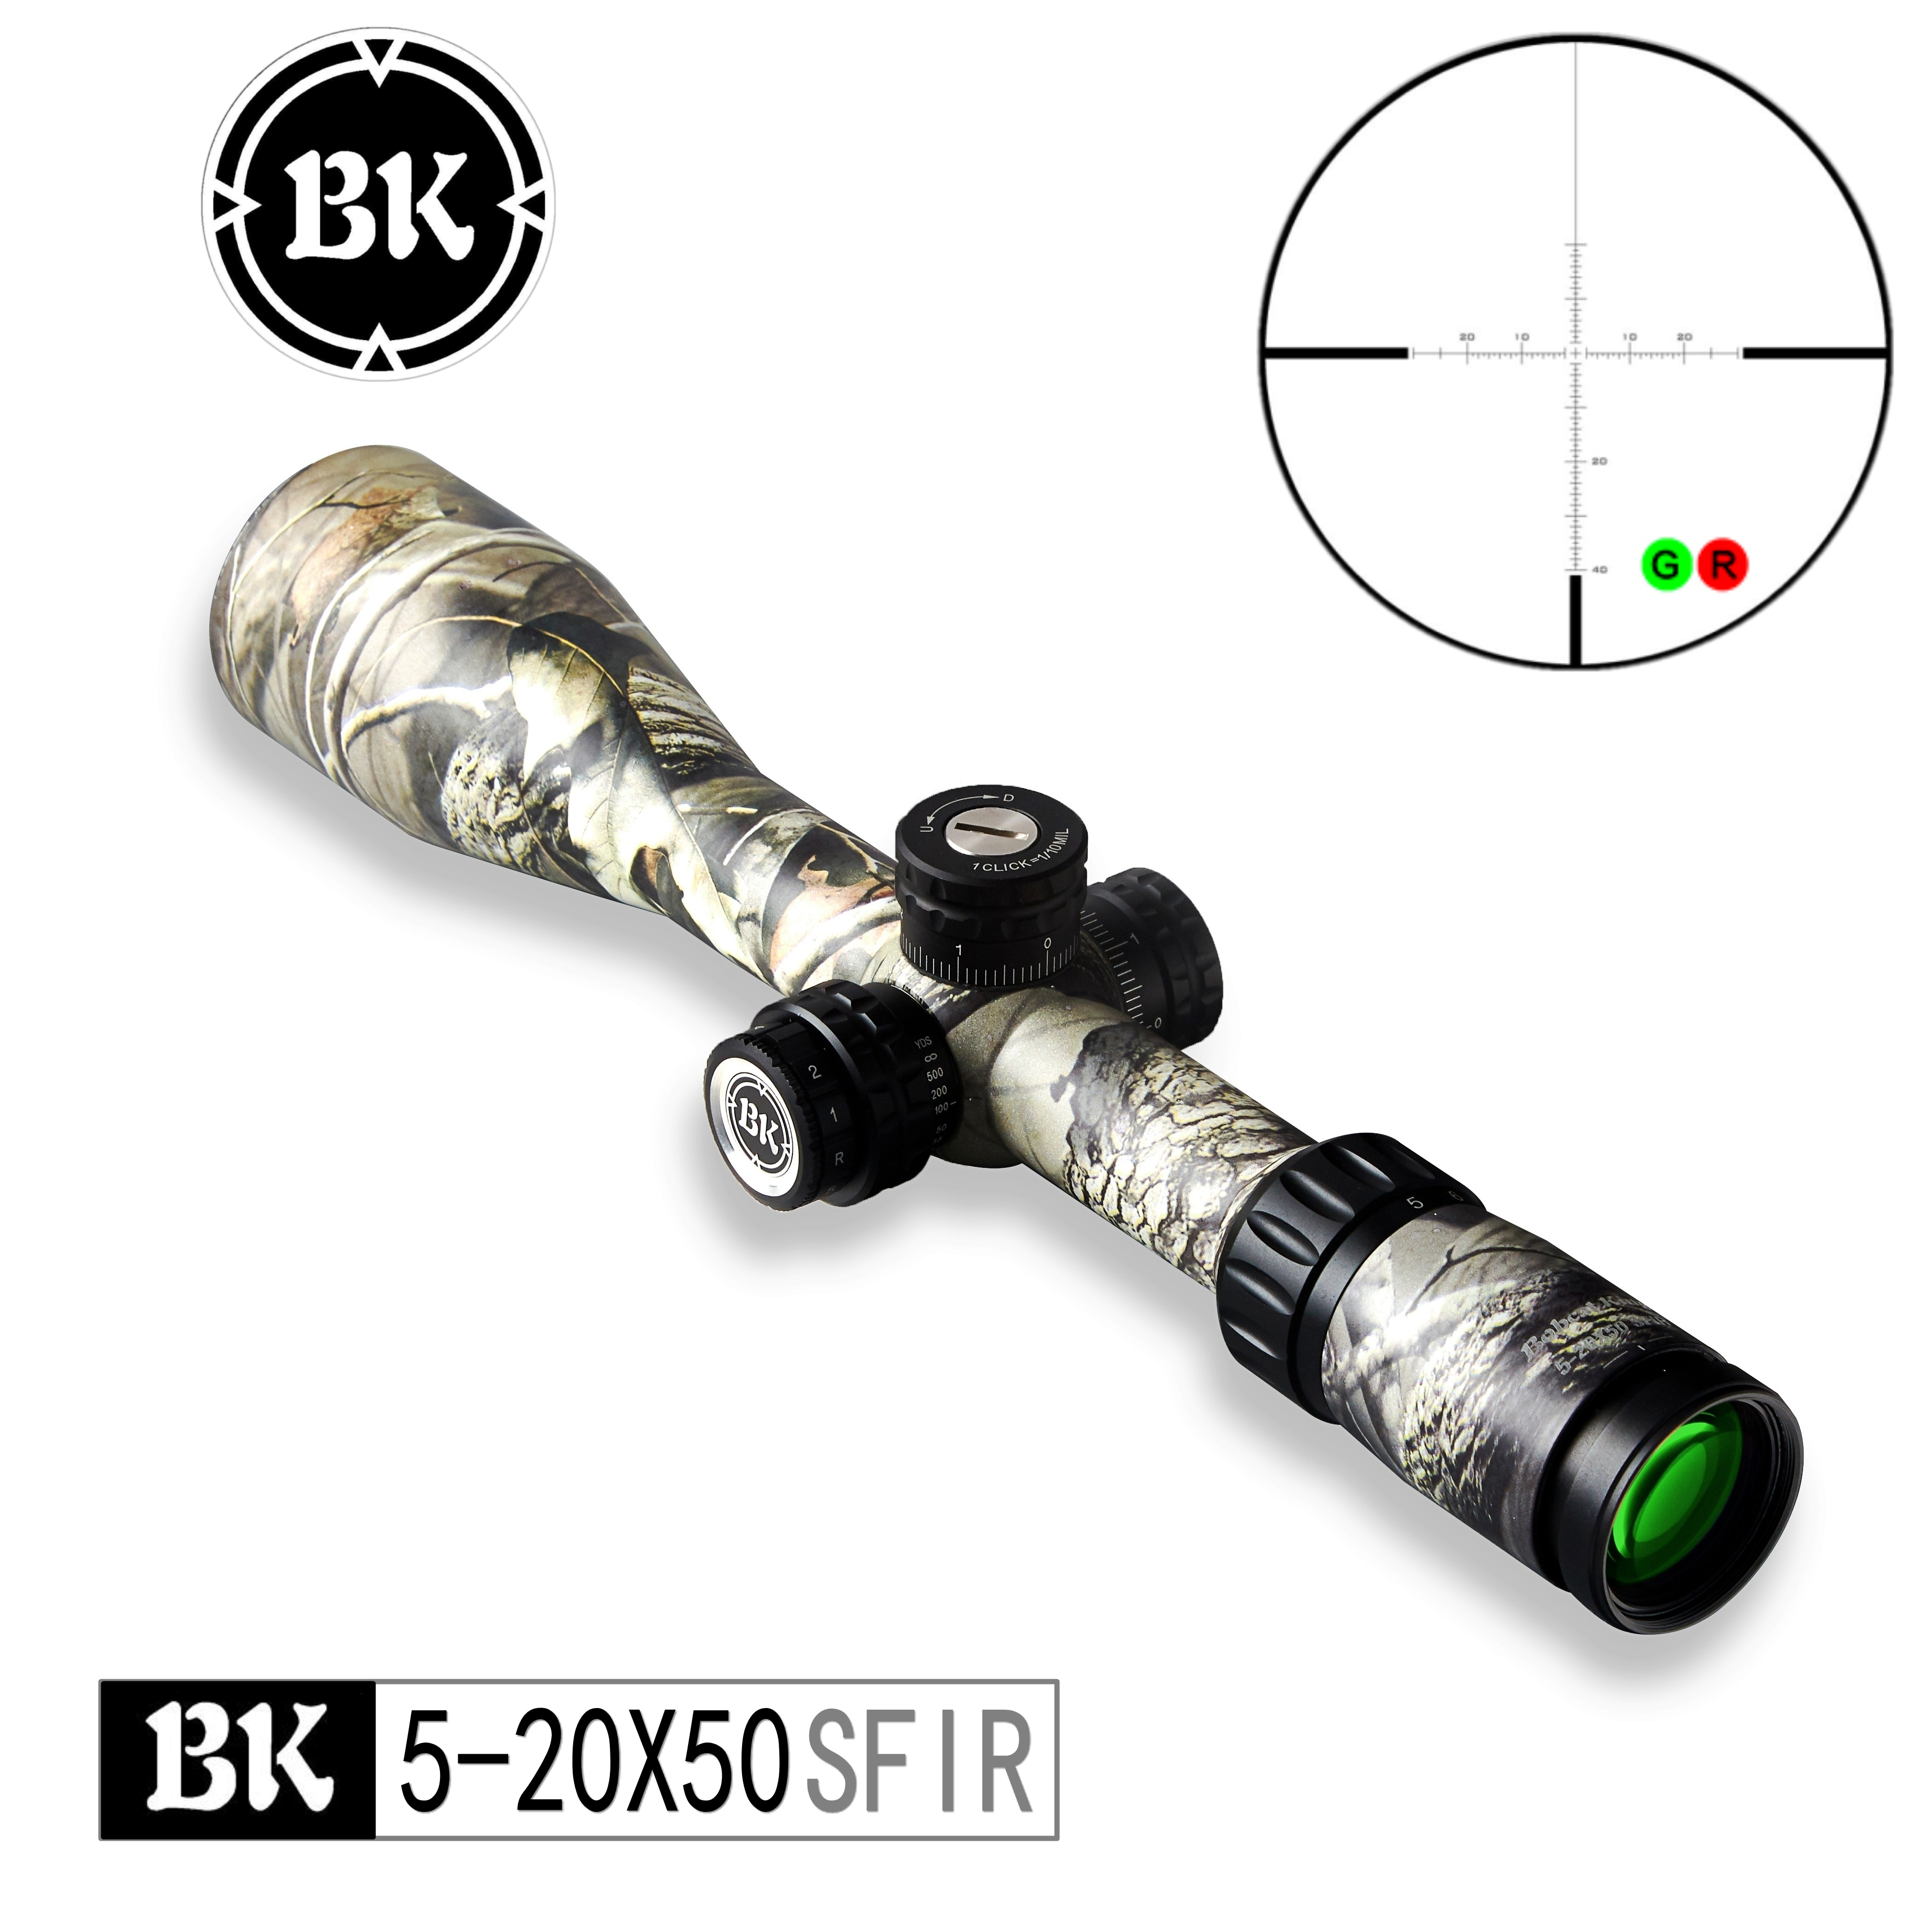 Mira óptica Bobcat King BK 5-20X50 SFIR, rifle de caza con apariencia de camuflaje, mira óptica táctica, rifle de caza, mira telescópica Juego de 12 unidades de herramientas ópticas para FTTH, con filtro de fibra de SKL-8A y medidor de Potencia Óptica, localizador Visual de fallos en 5km